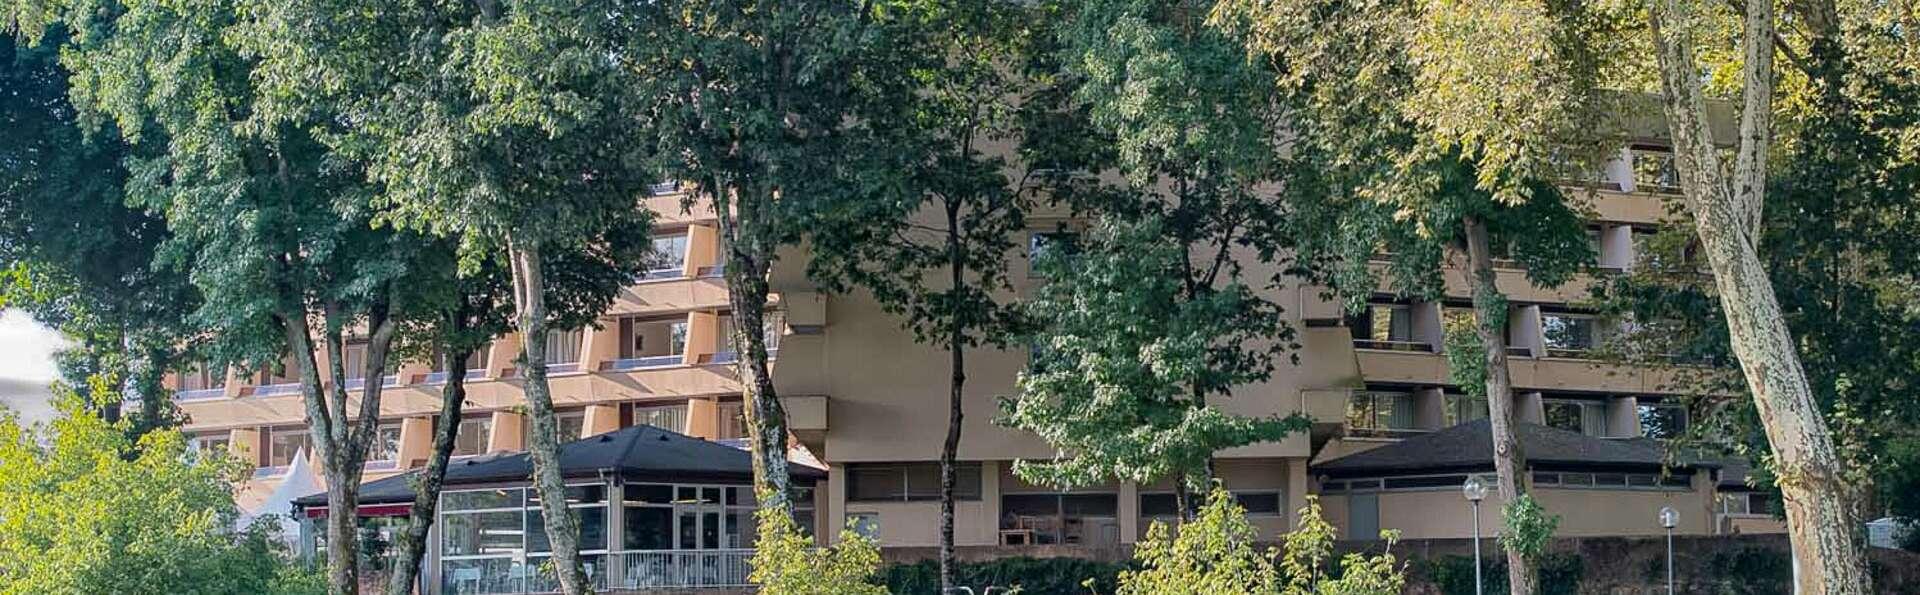 Dax Hotel - EDIT_FRONT_03.jpg